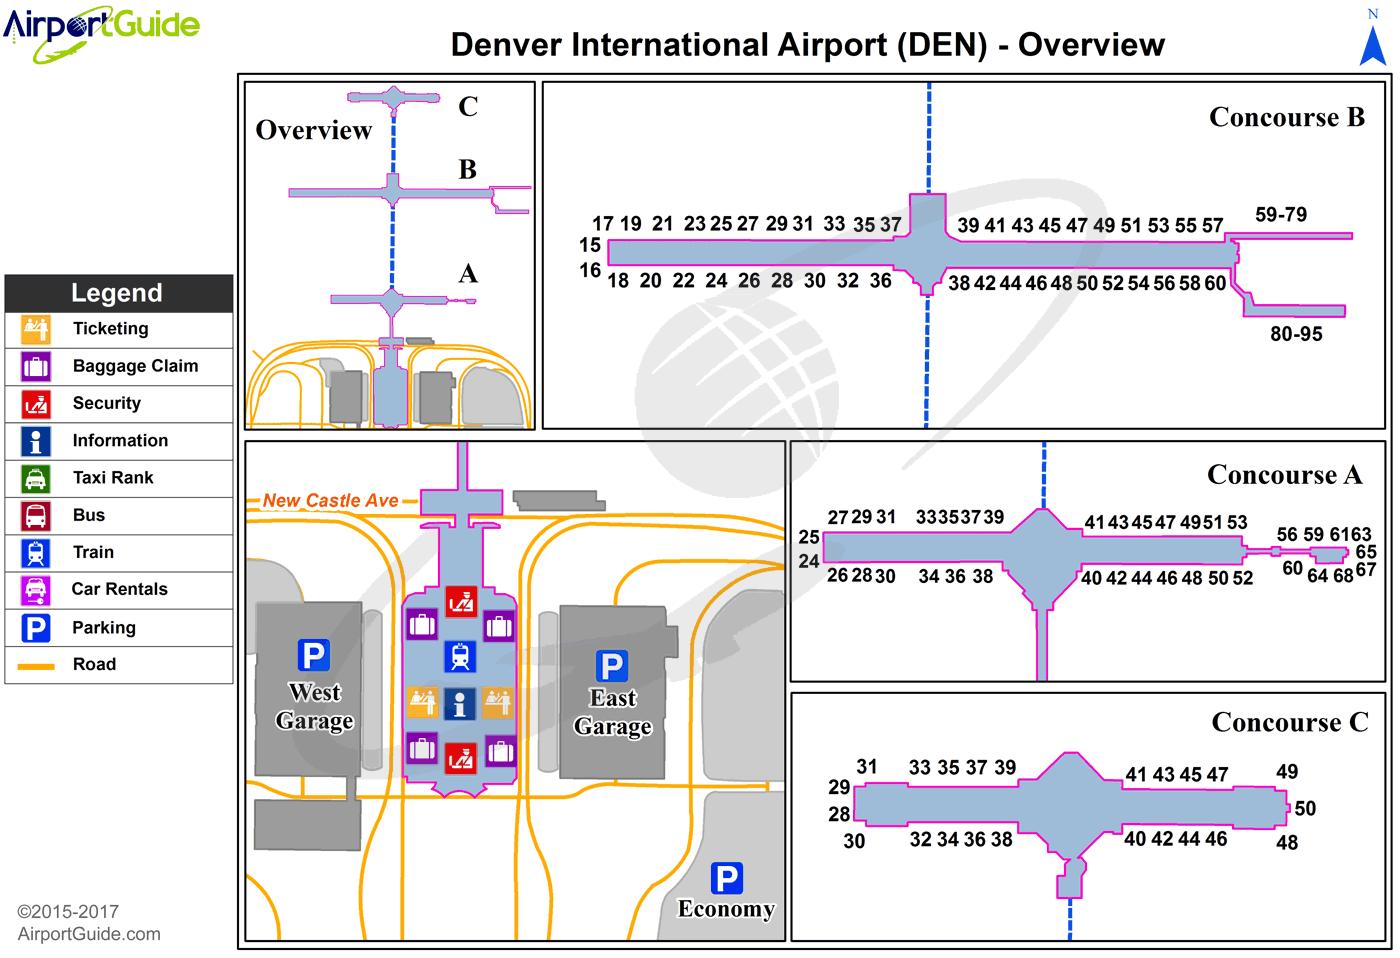 Denver Denver International Den Airport Terminal Map Overview Airport Map Denver International Airport Airport Guide